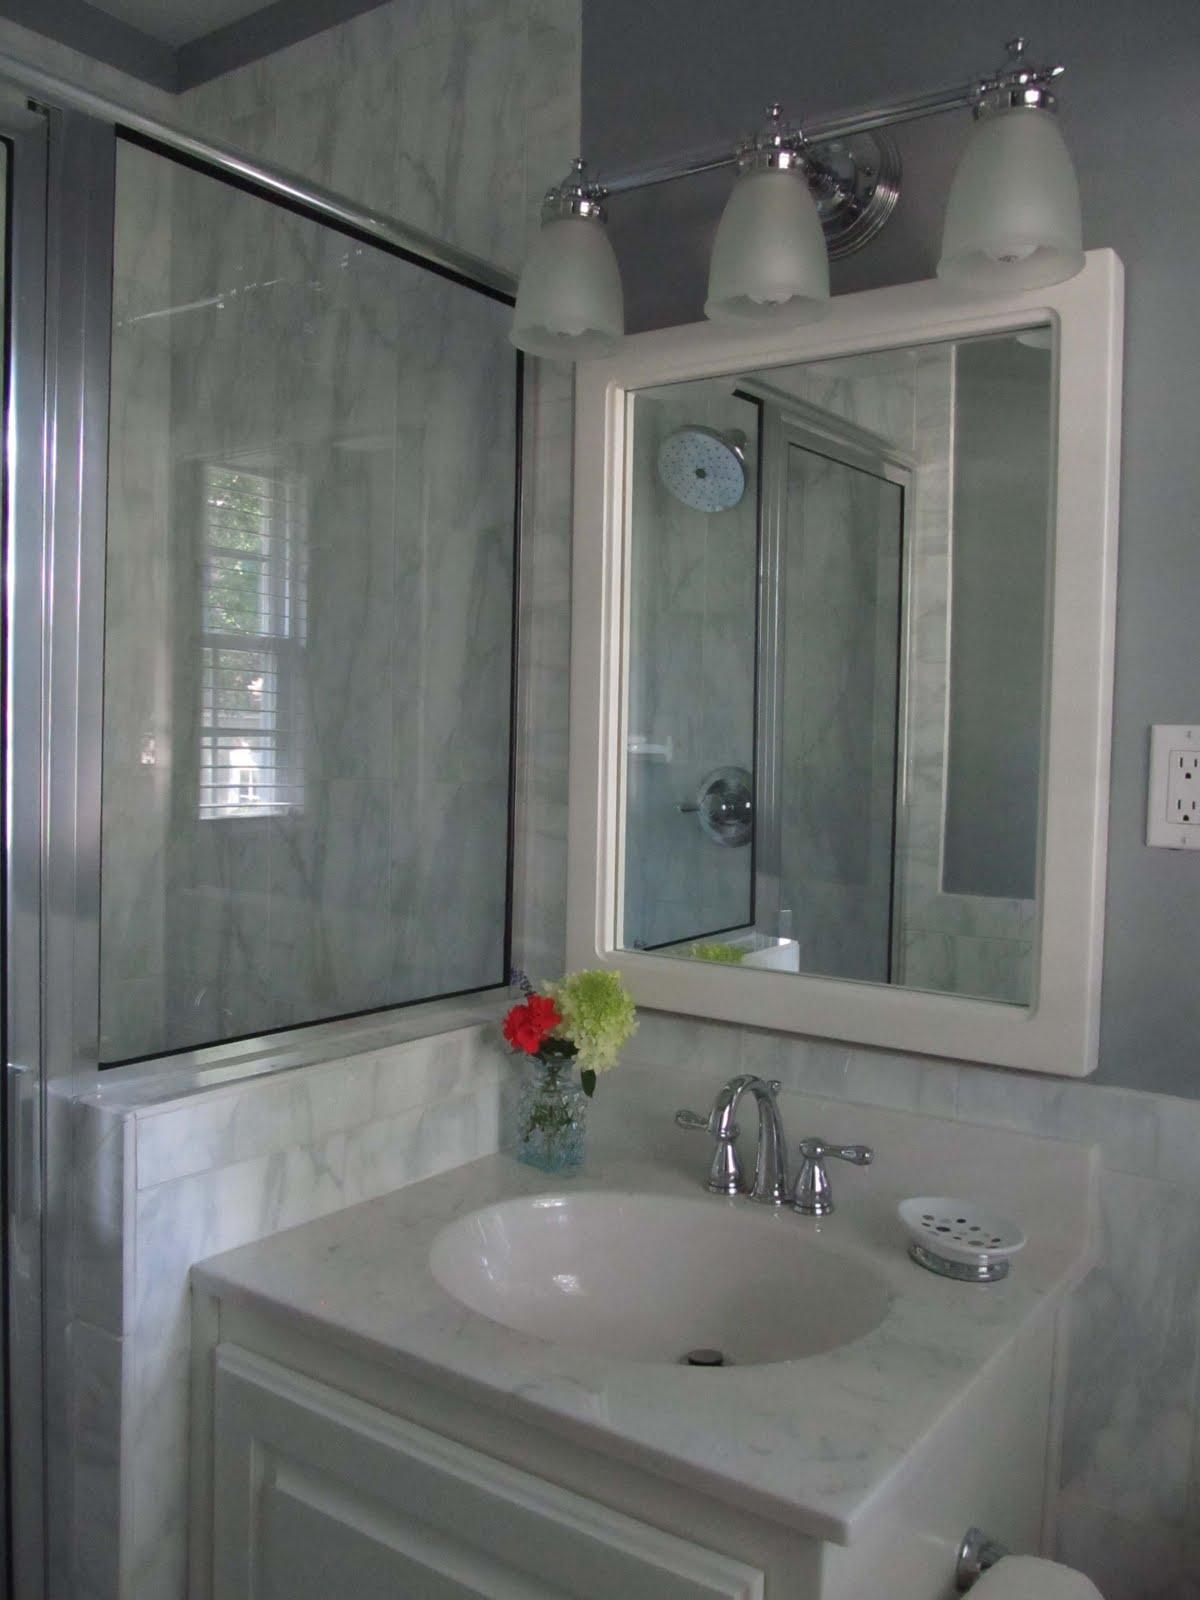 1980s Bath Renovation Sleek and Modern